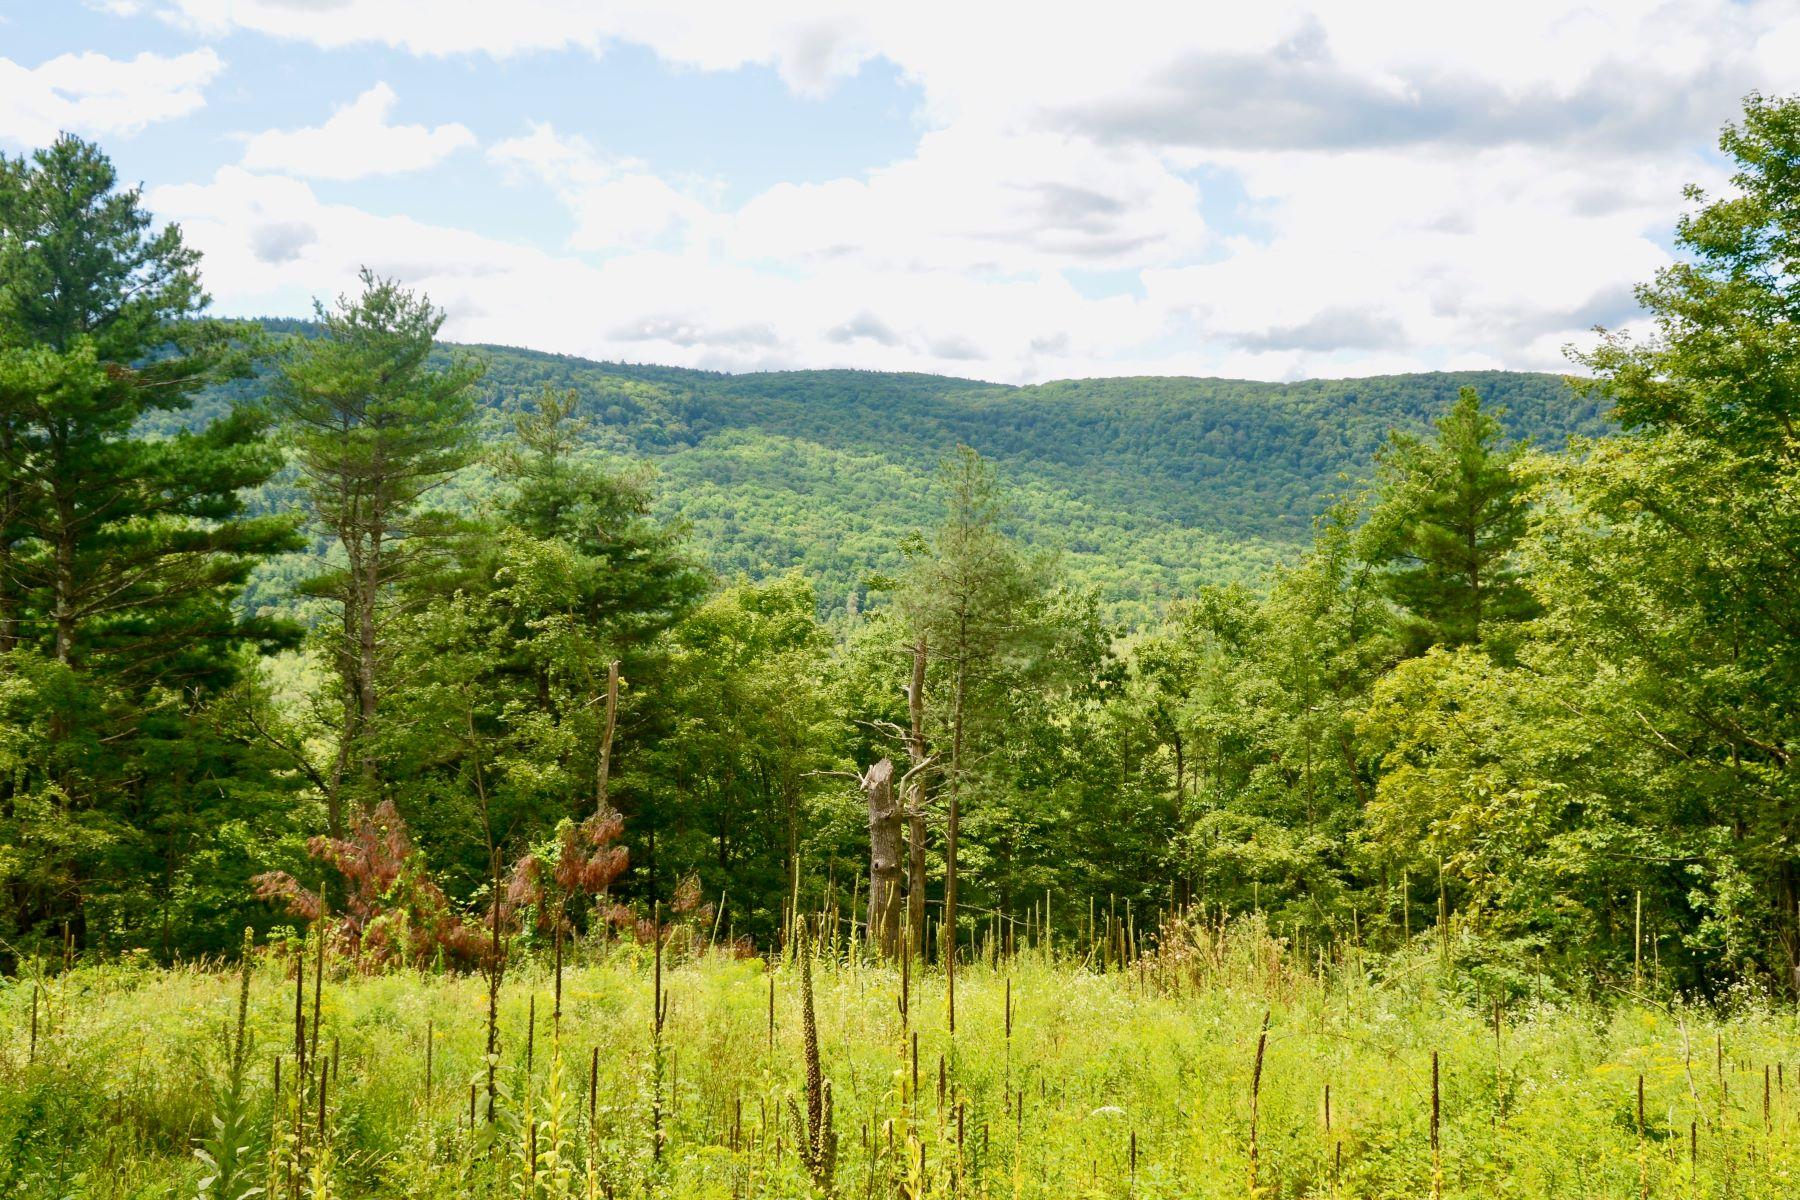 土地,用地 为 销售 在 87 Acres with Tyringham Valley Views 3 Main Rd, 蒂林厄姆, 马萨诸塞州 01264 美国